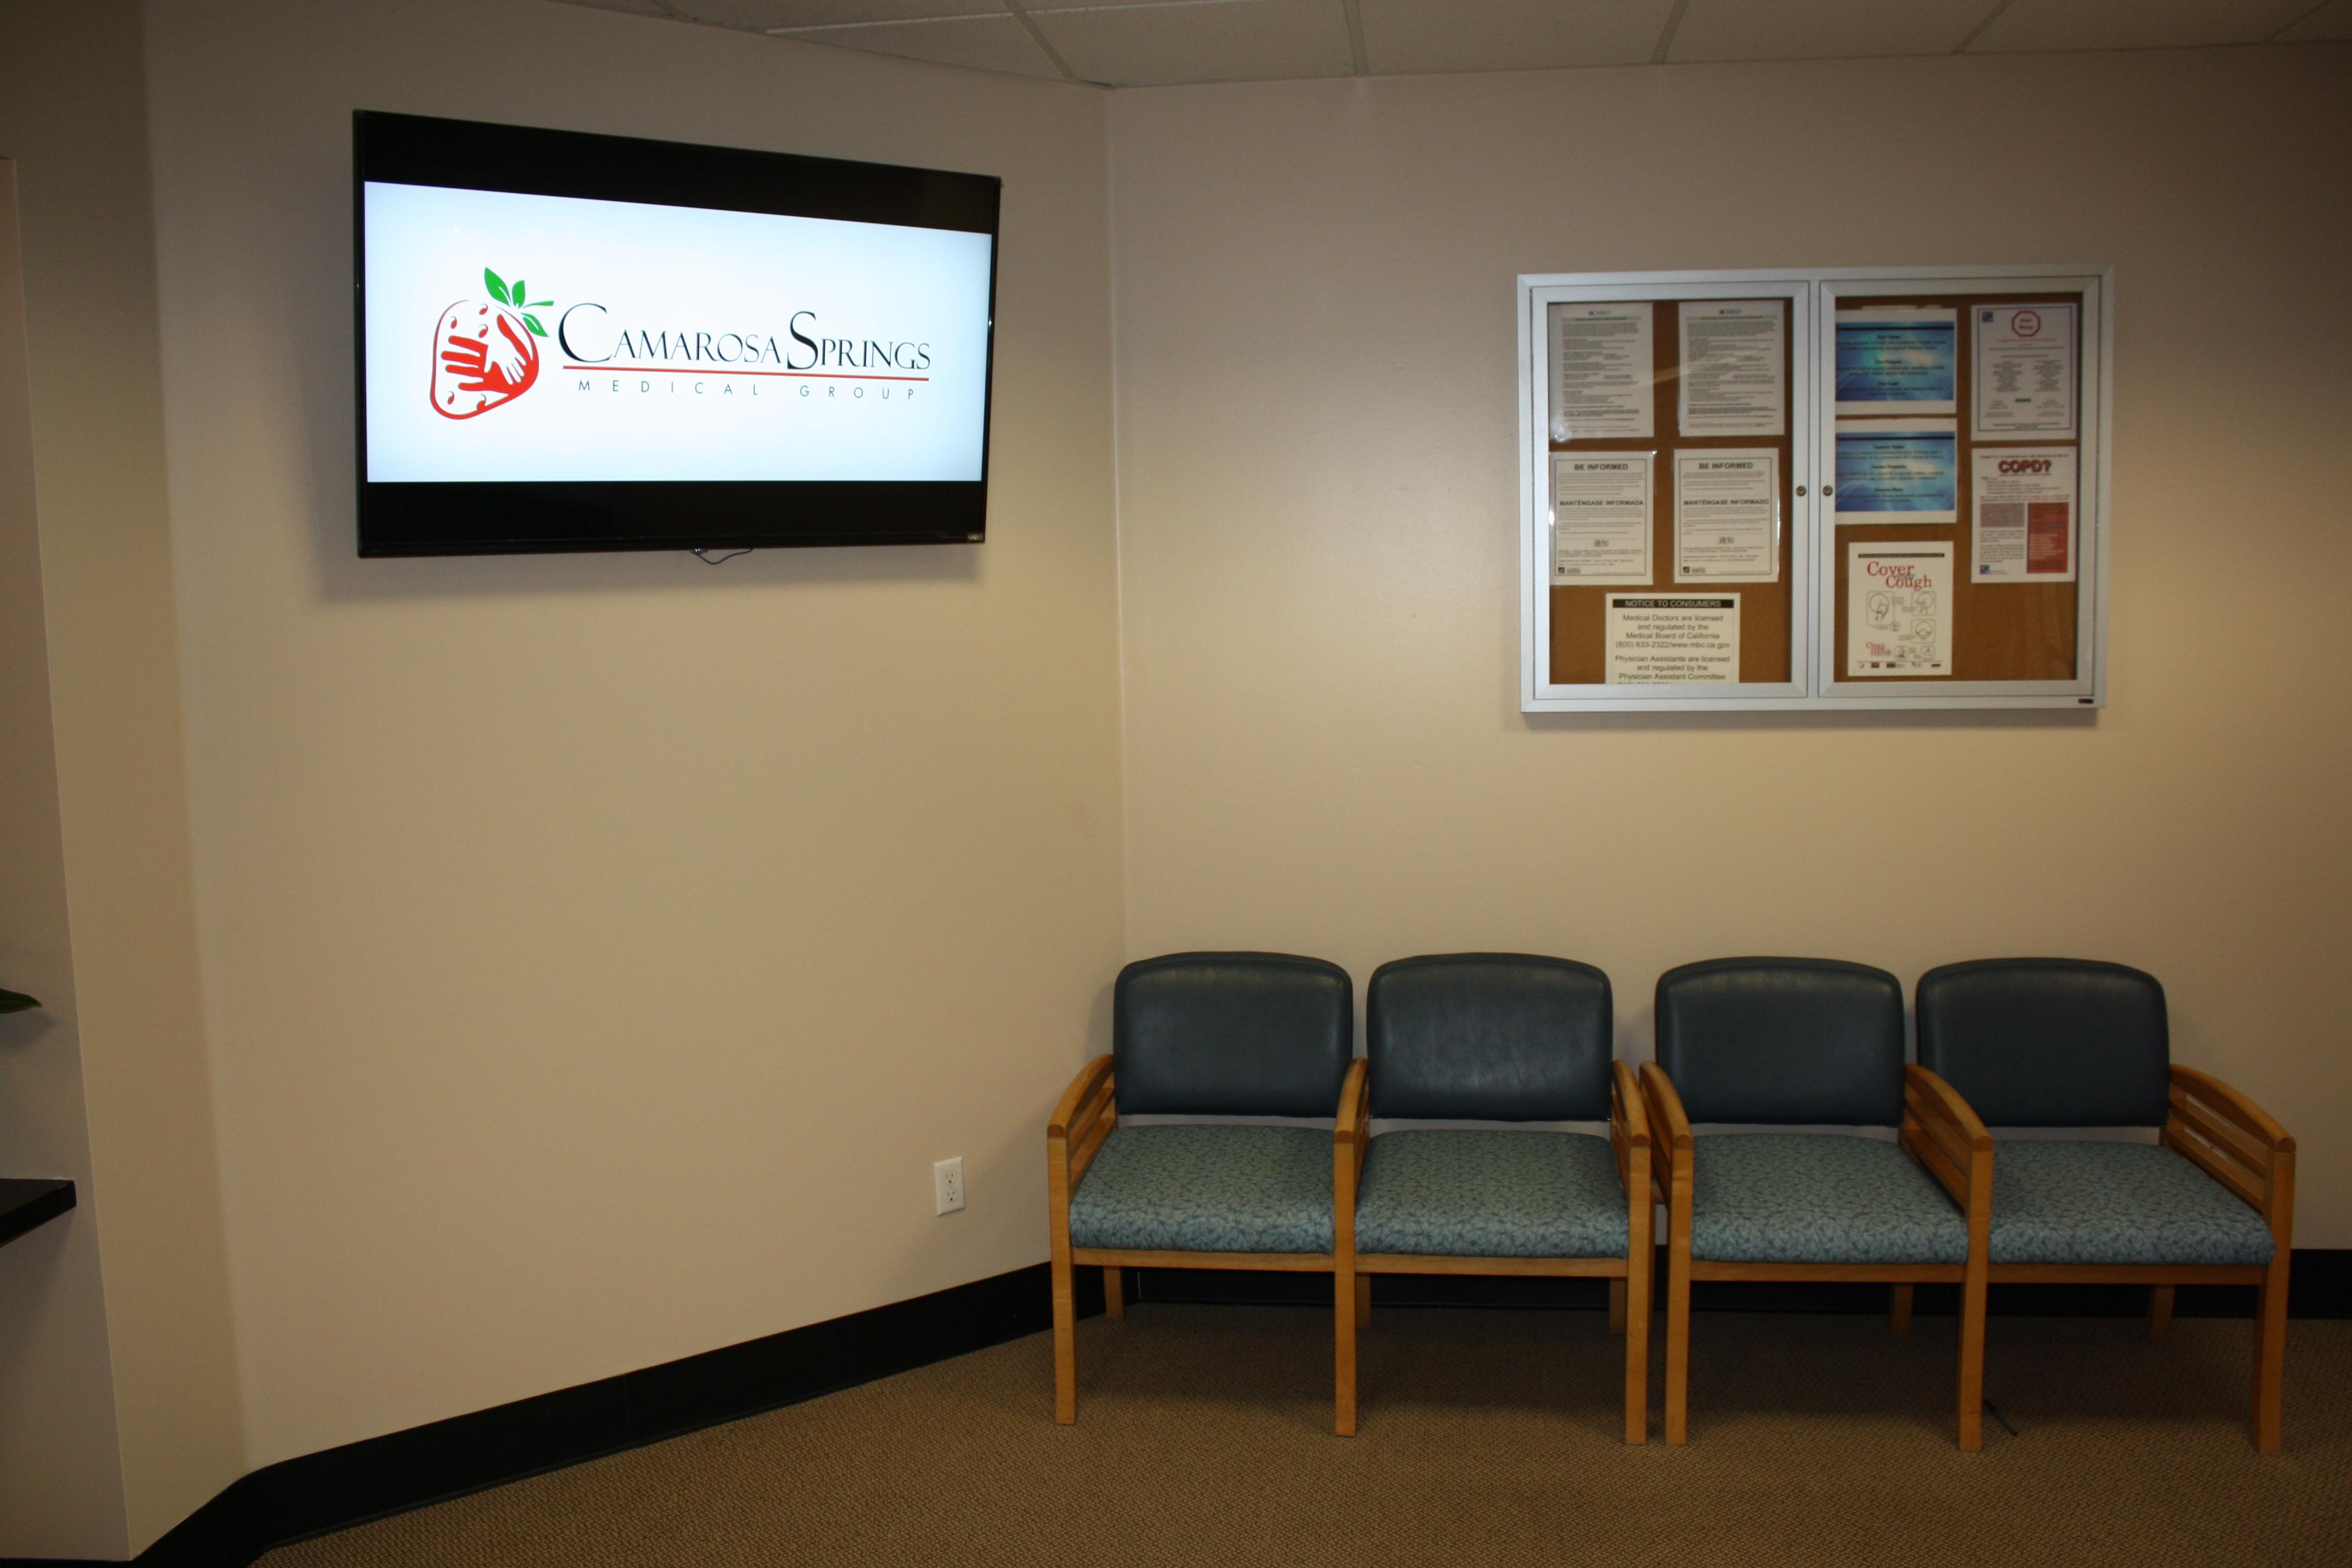 Camarosa Springs Medical Group image 2